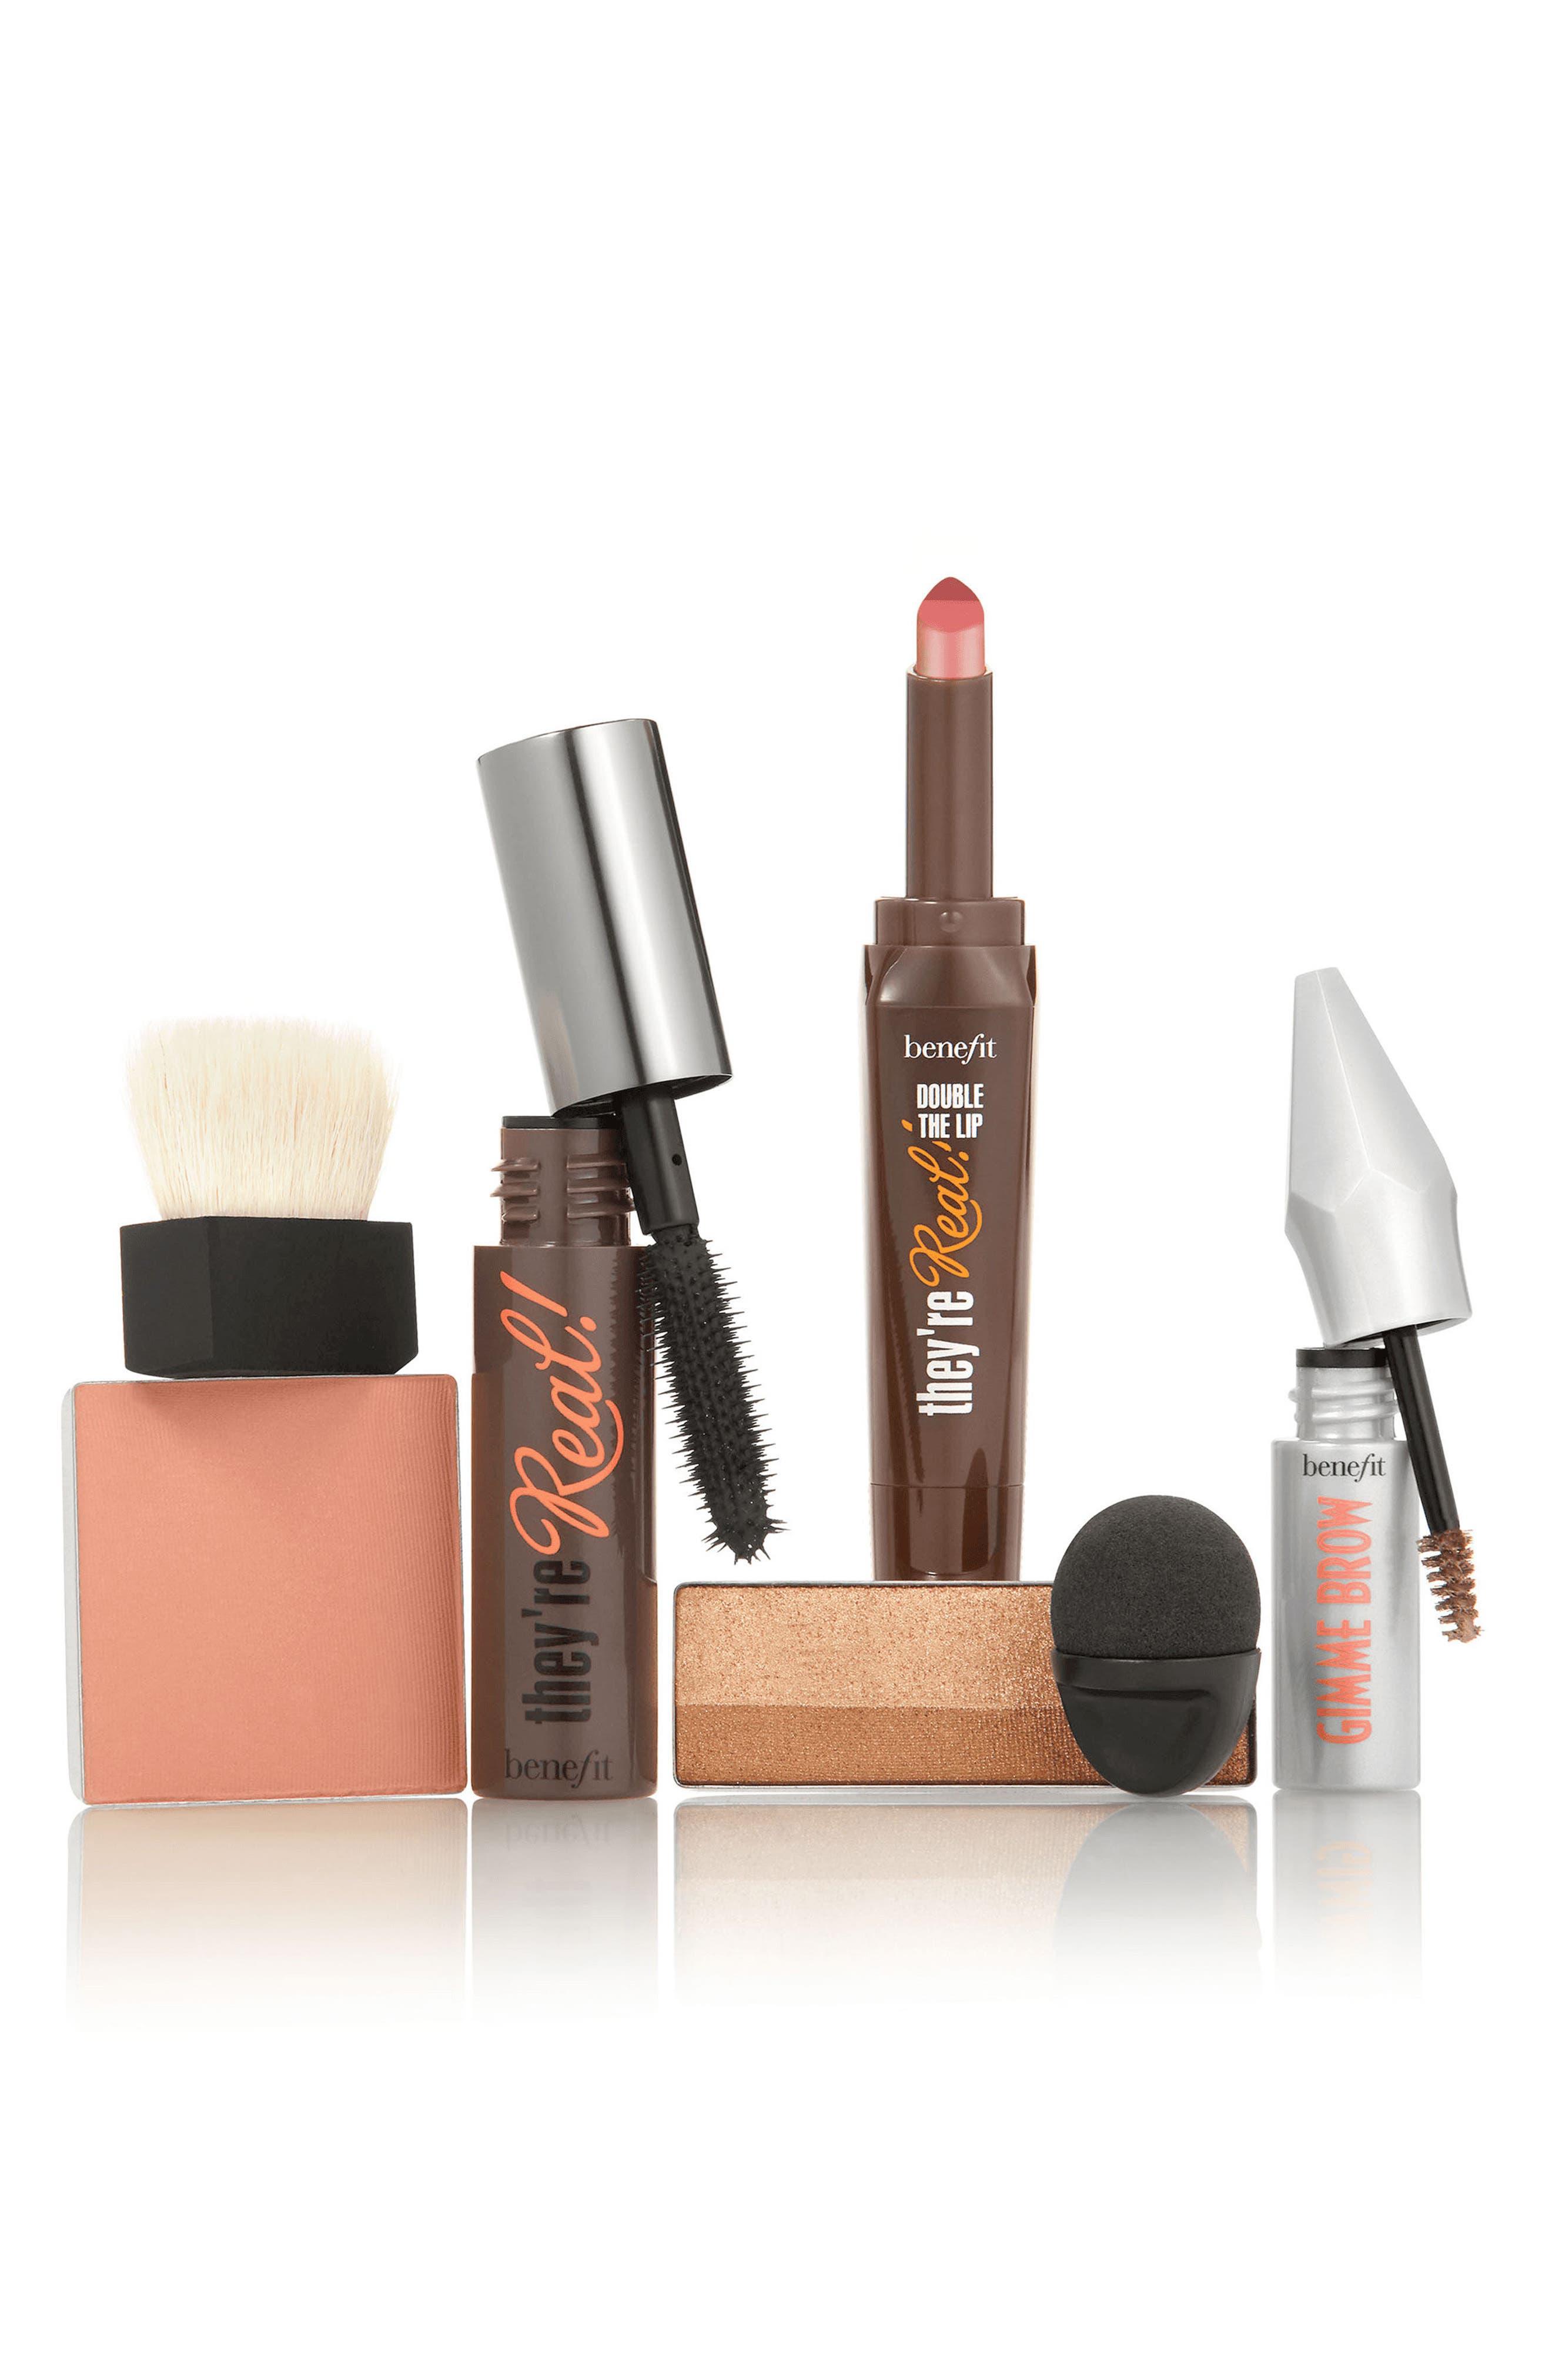 Benefit Golden Gate Glam Complete Makeup Kit,                             Alternate thumbnail 3, color,                             000